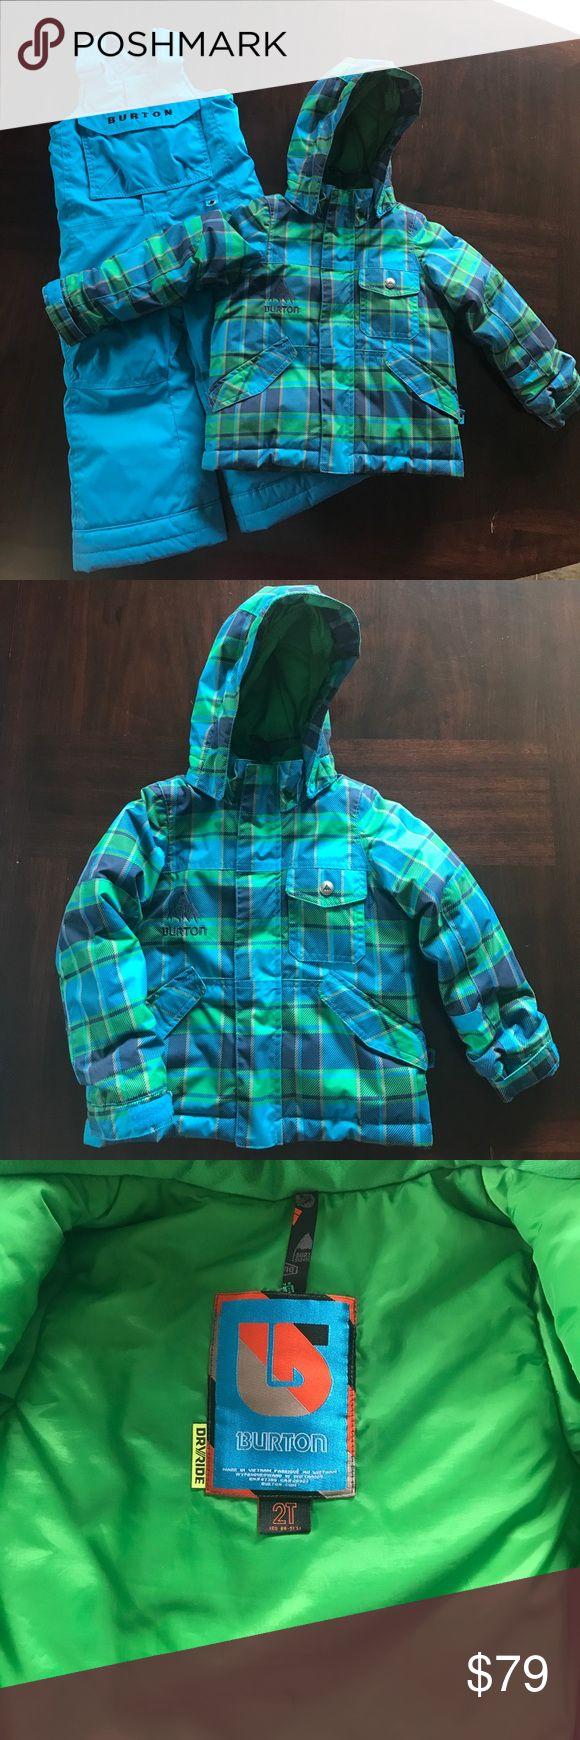 Burton ski jacket and snow pants Like new condition Burton ski jacket and matching snow pants. There are no rips, tears and stains. Smoke free home! Burton Matching Sets